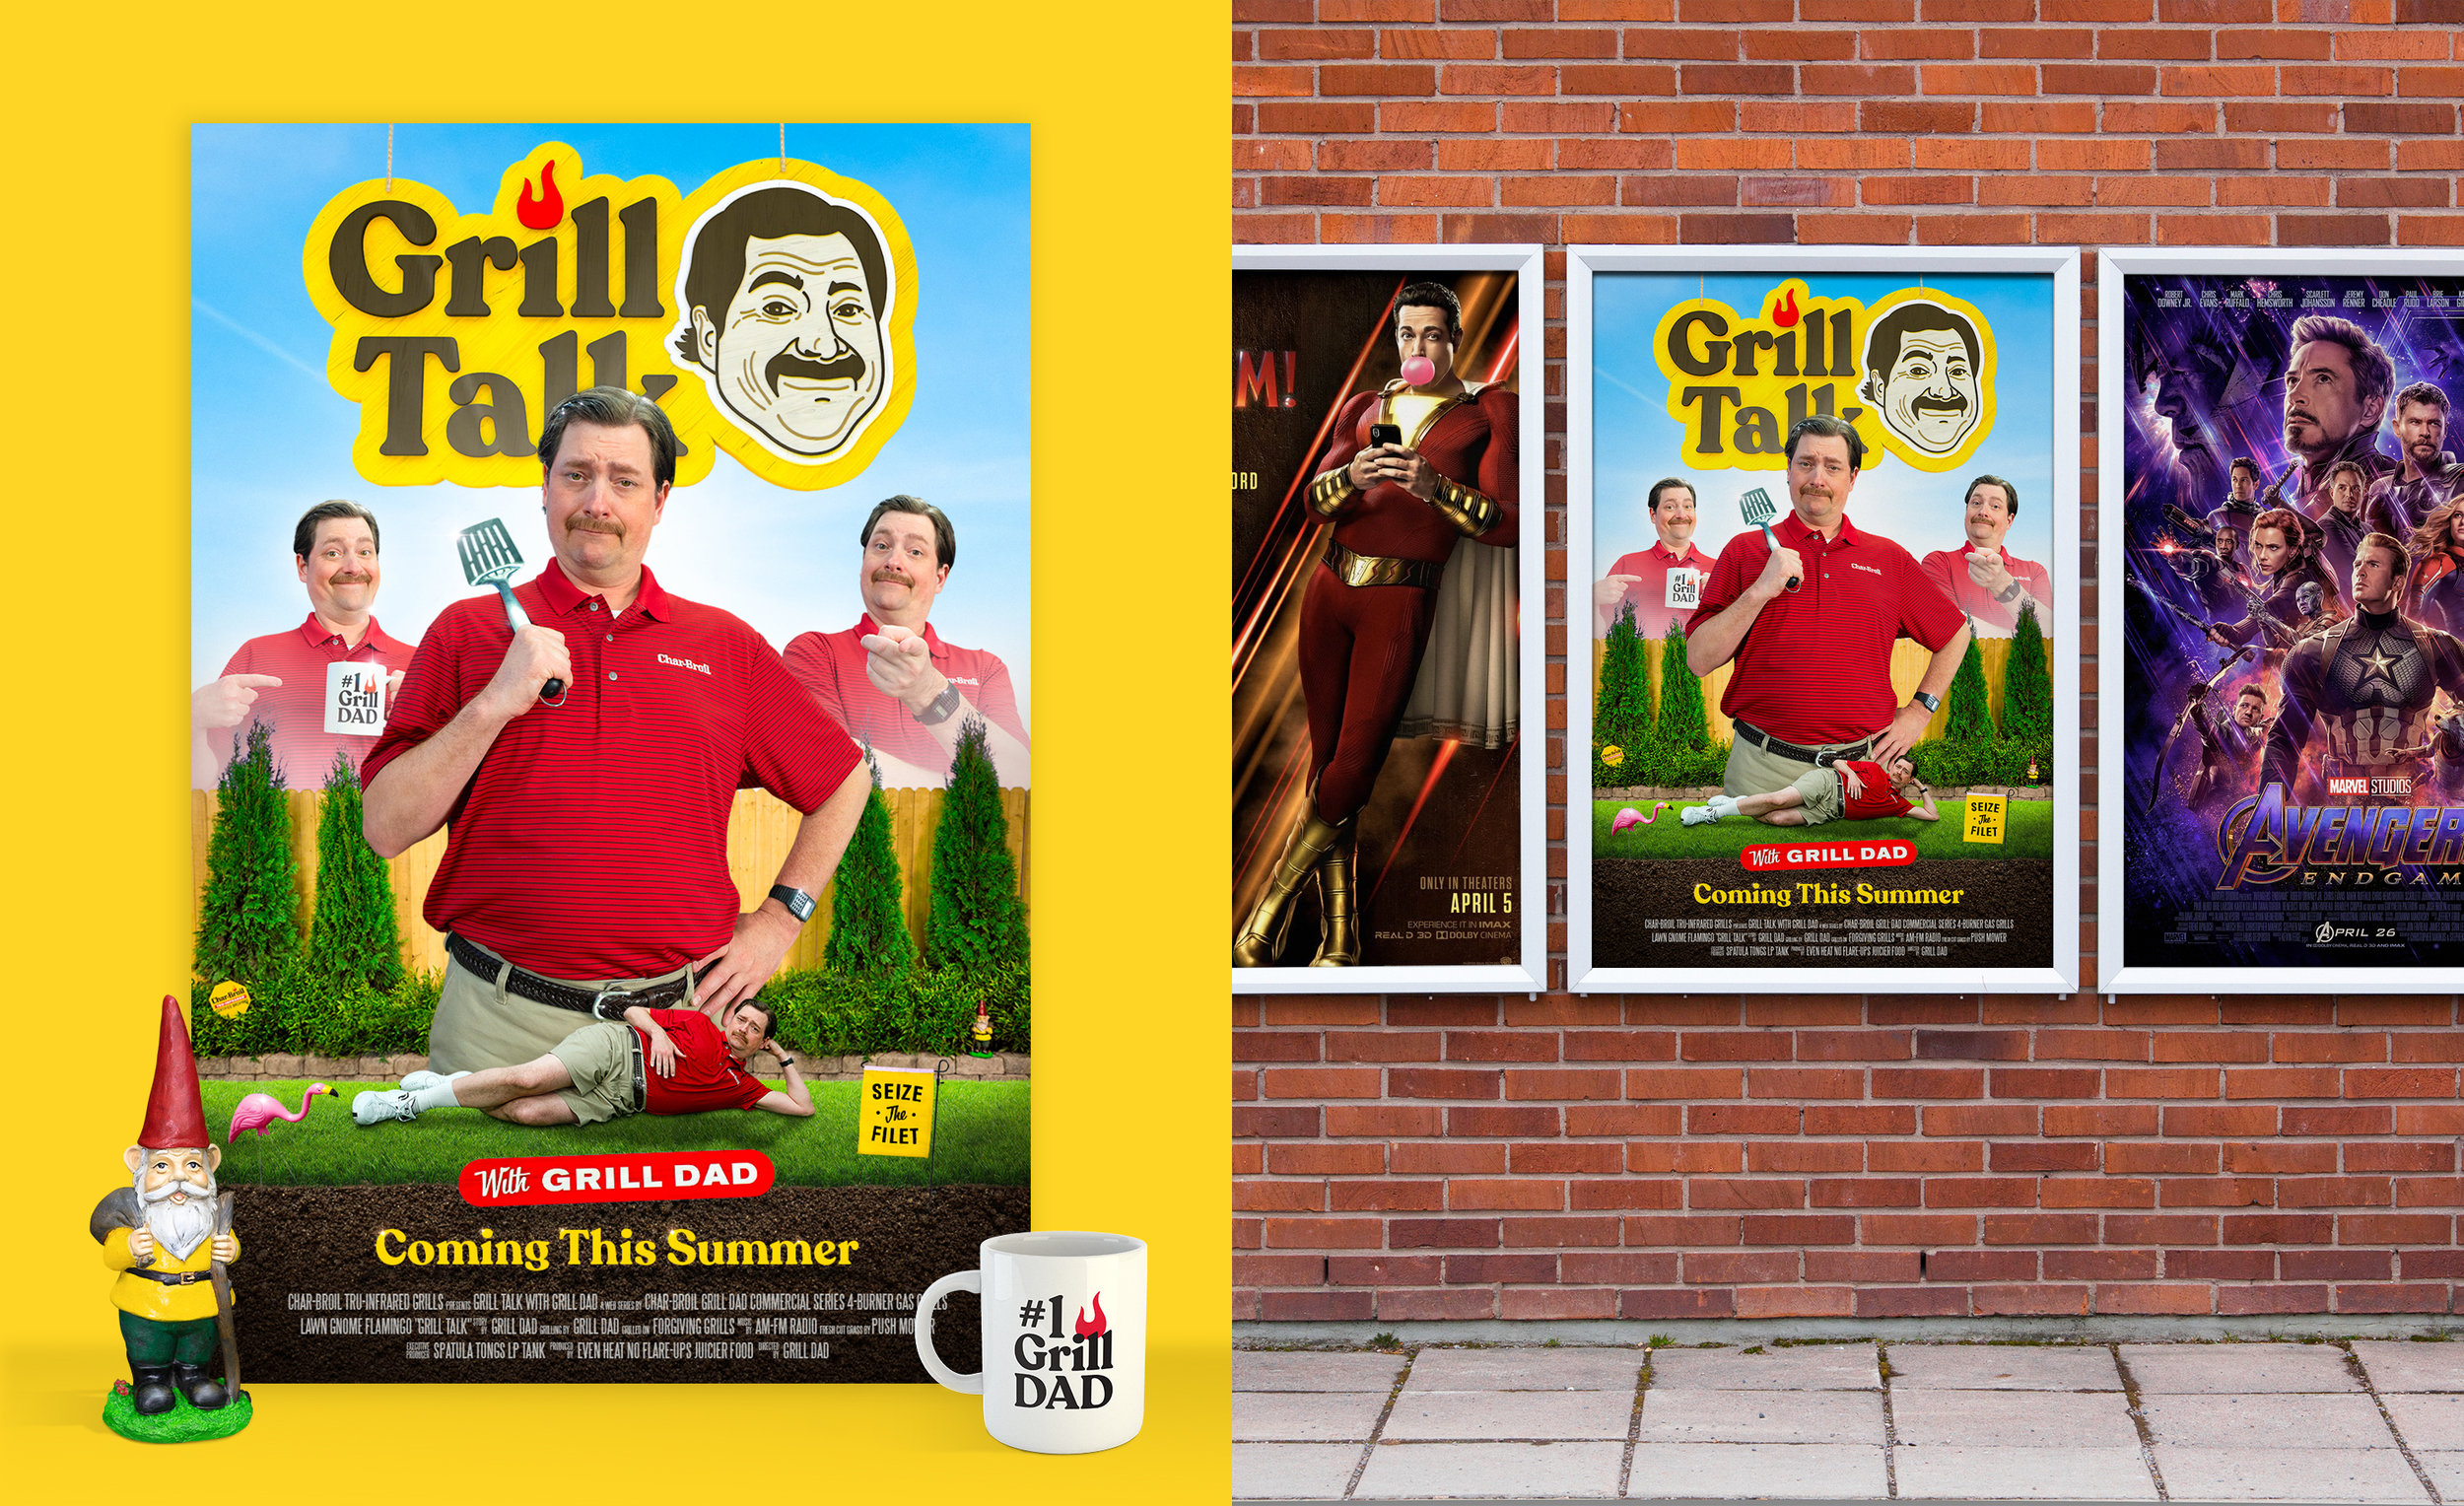 GrillTalk_Posters.jpg